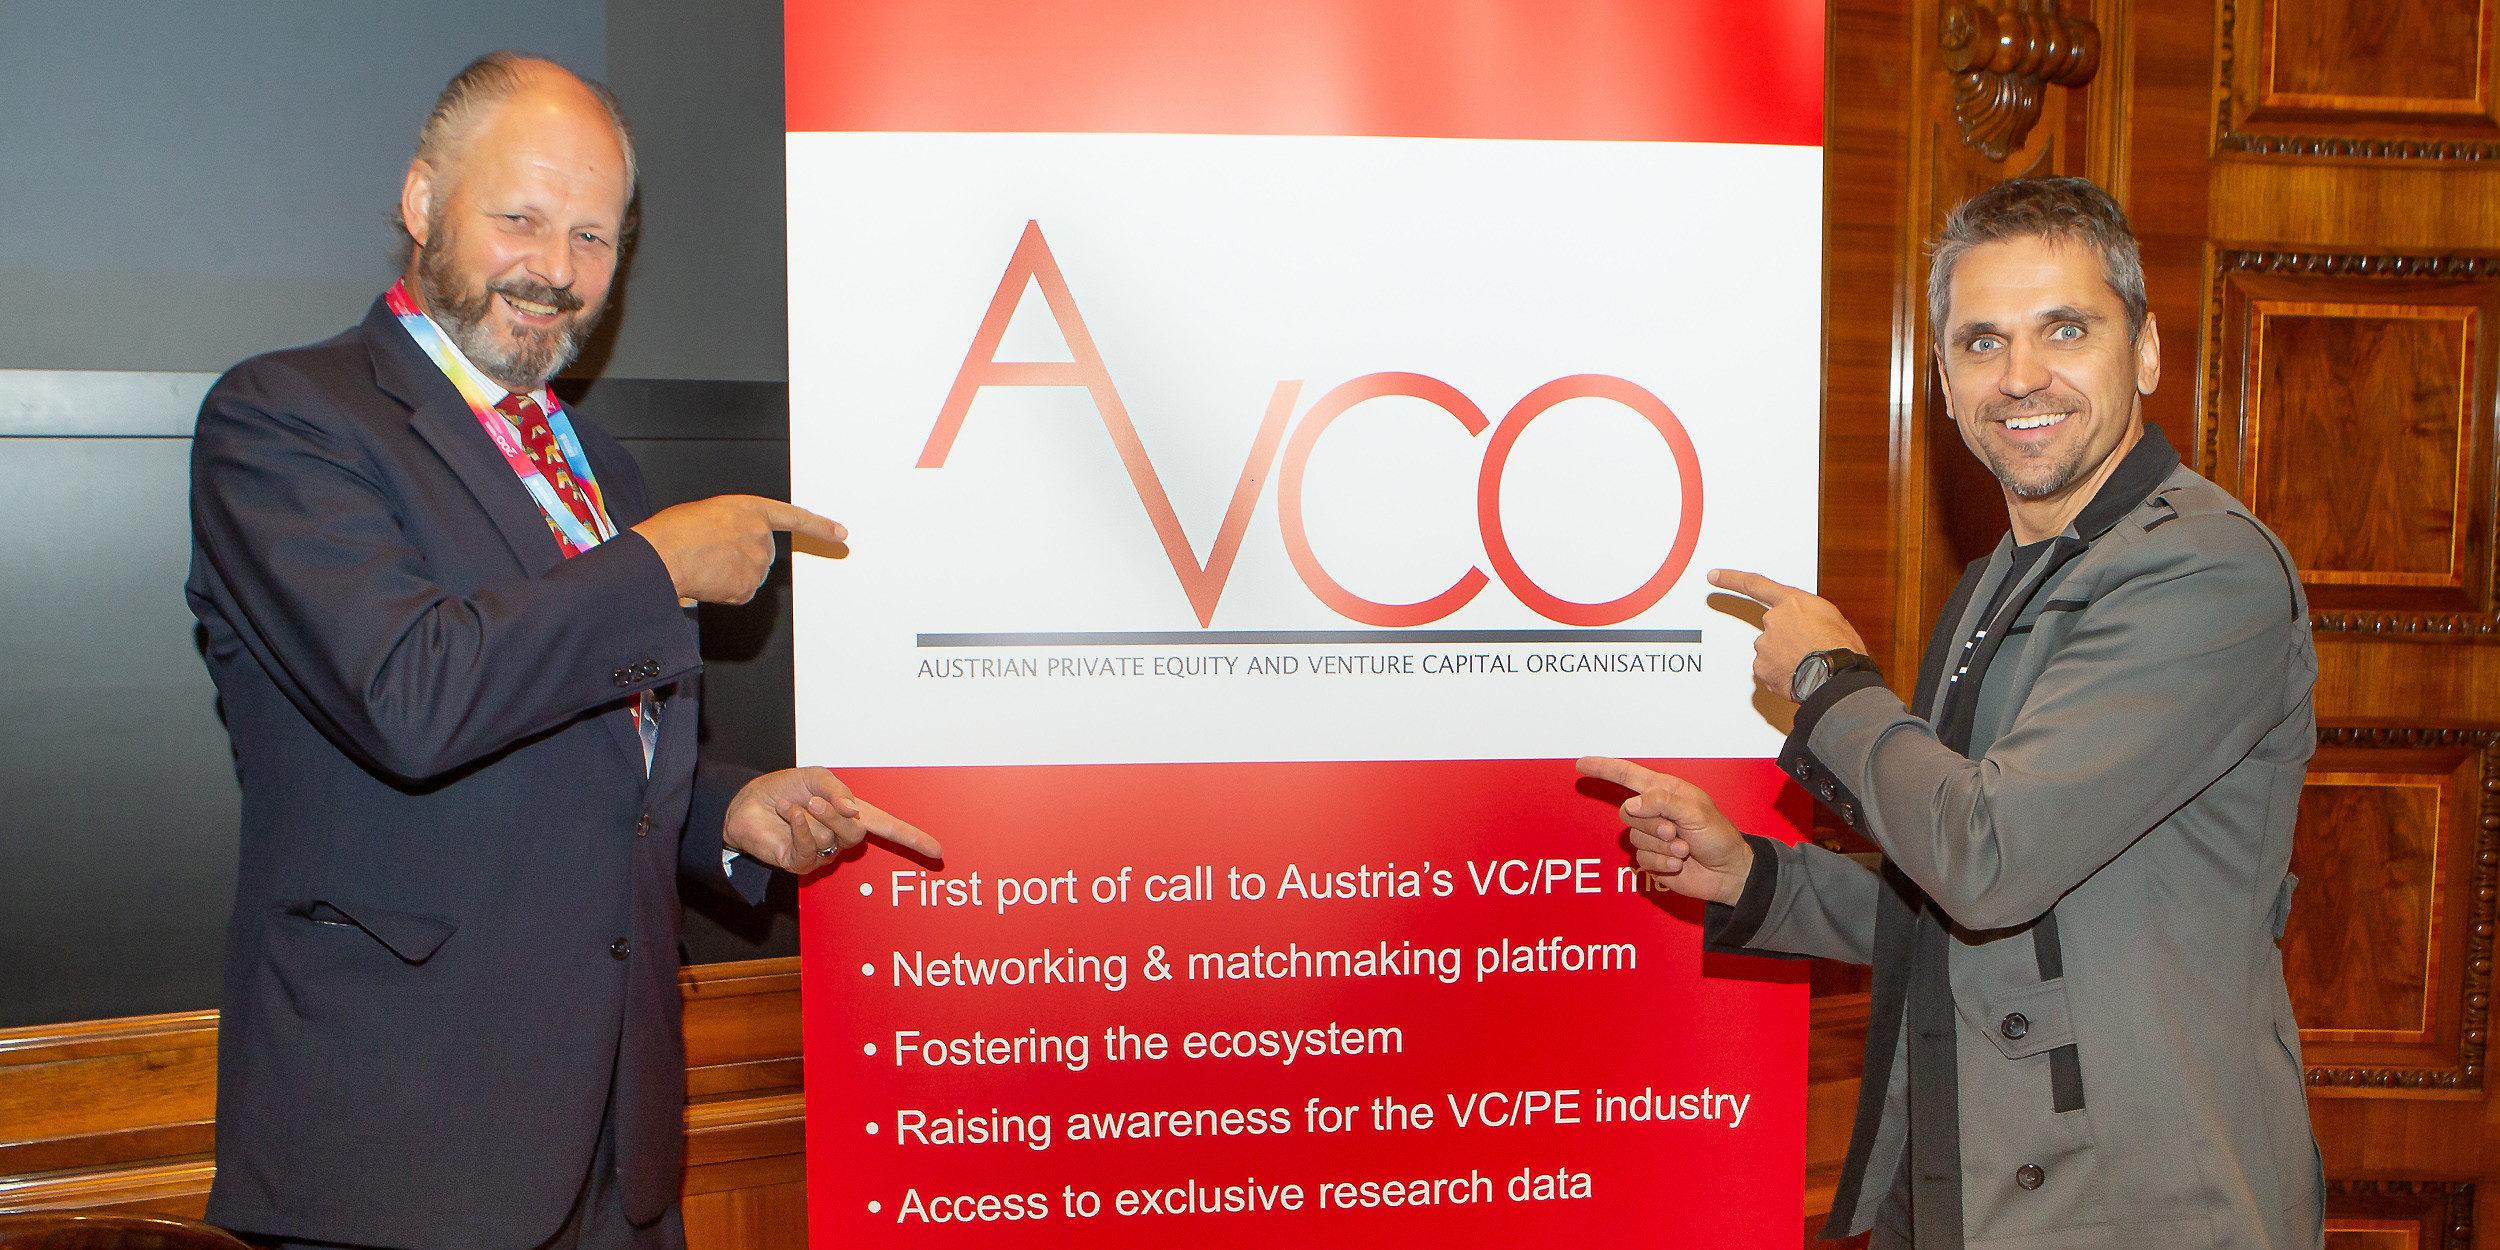 avco - Sorge um intransparente Vergabe bei VC-Fonds im Corona-Startup-Hilfspaket